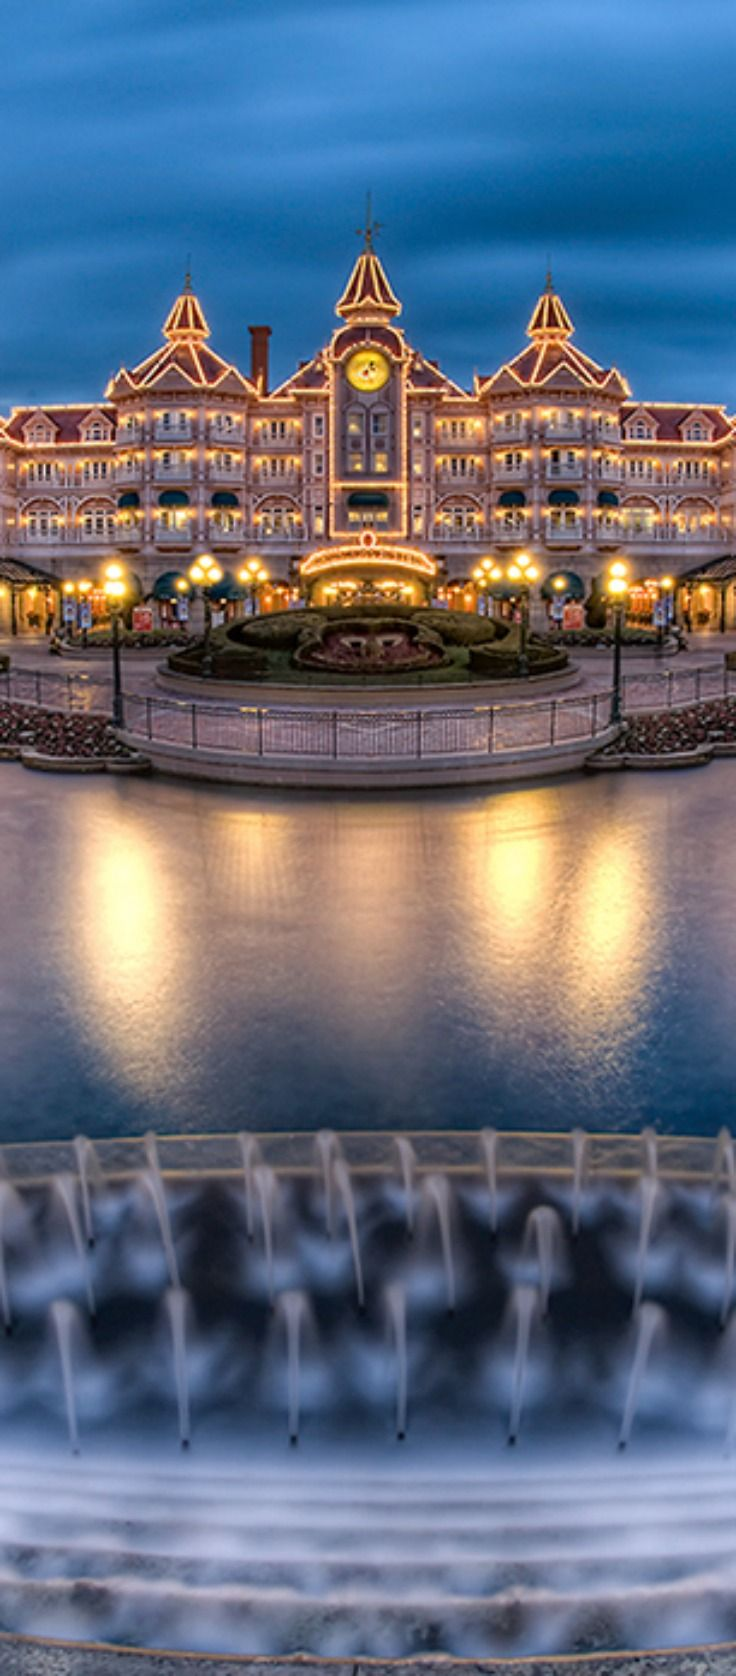 Disneyland PARIS, EuroDisney, France